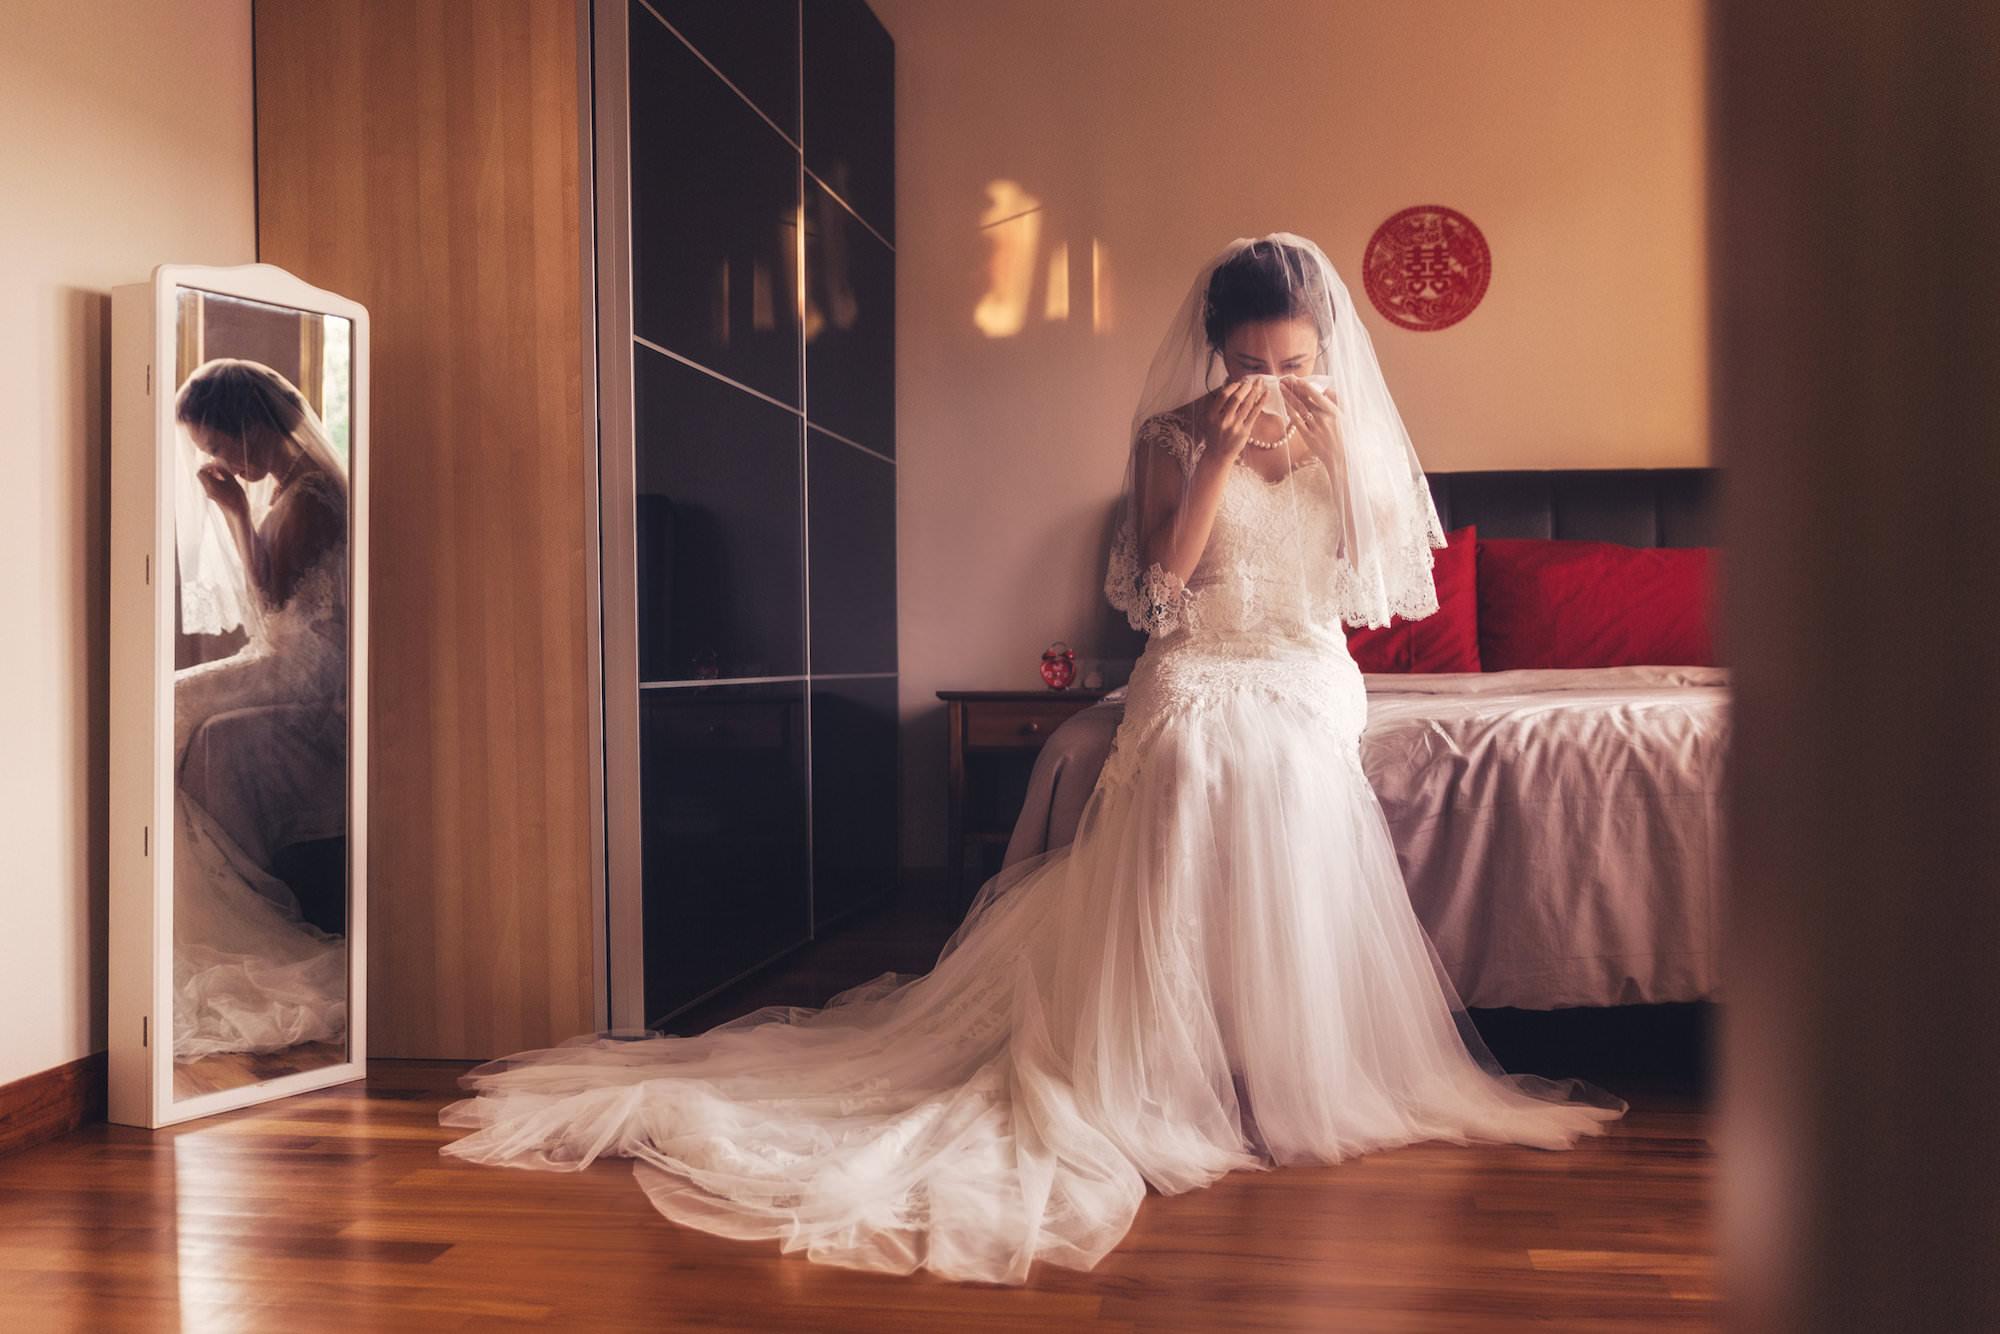 Sui & Nic - Singapore Wedding Photography 8.jpg